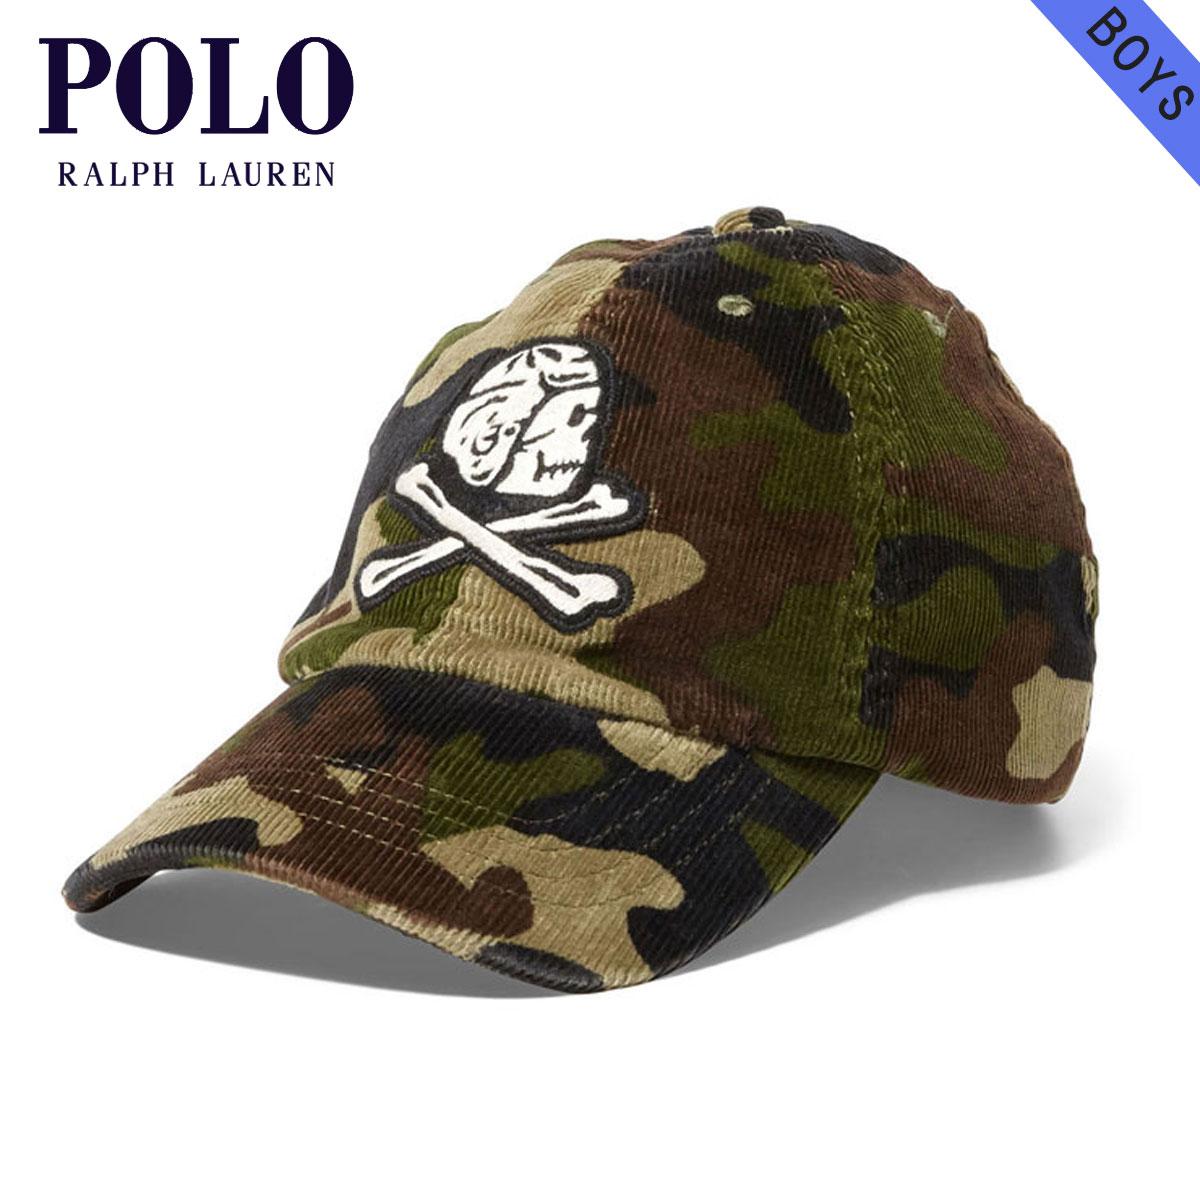 85957831199 Poloralflorenkids POLO RALPH LAUREN CHILDREN genuine kids clothing boys Hat  Cap CAMO COTTON CORDUROY CAP 96854756